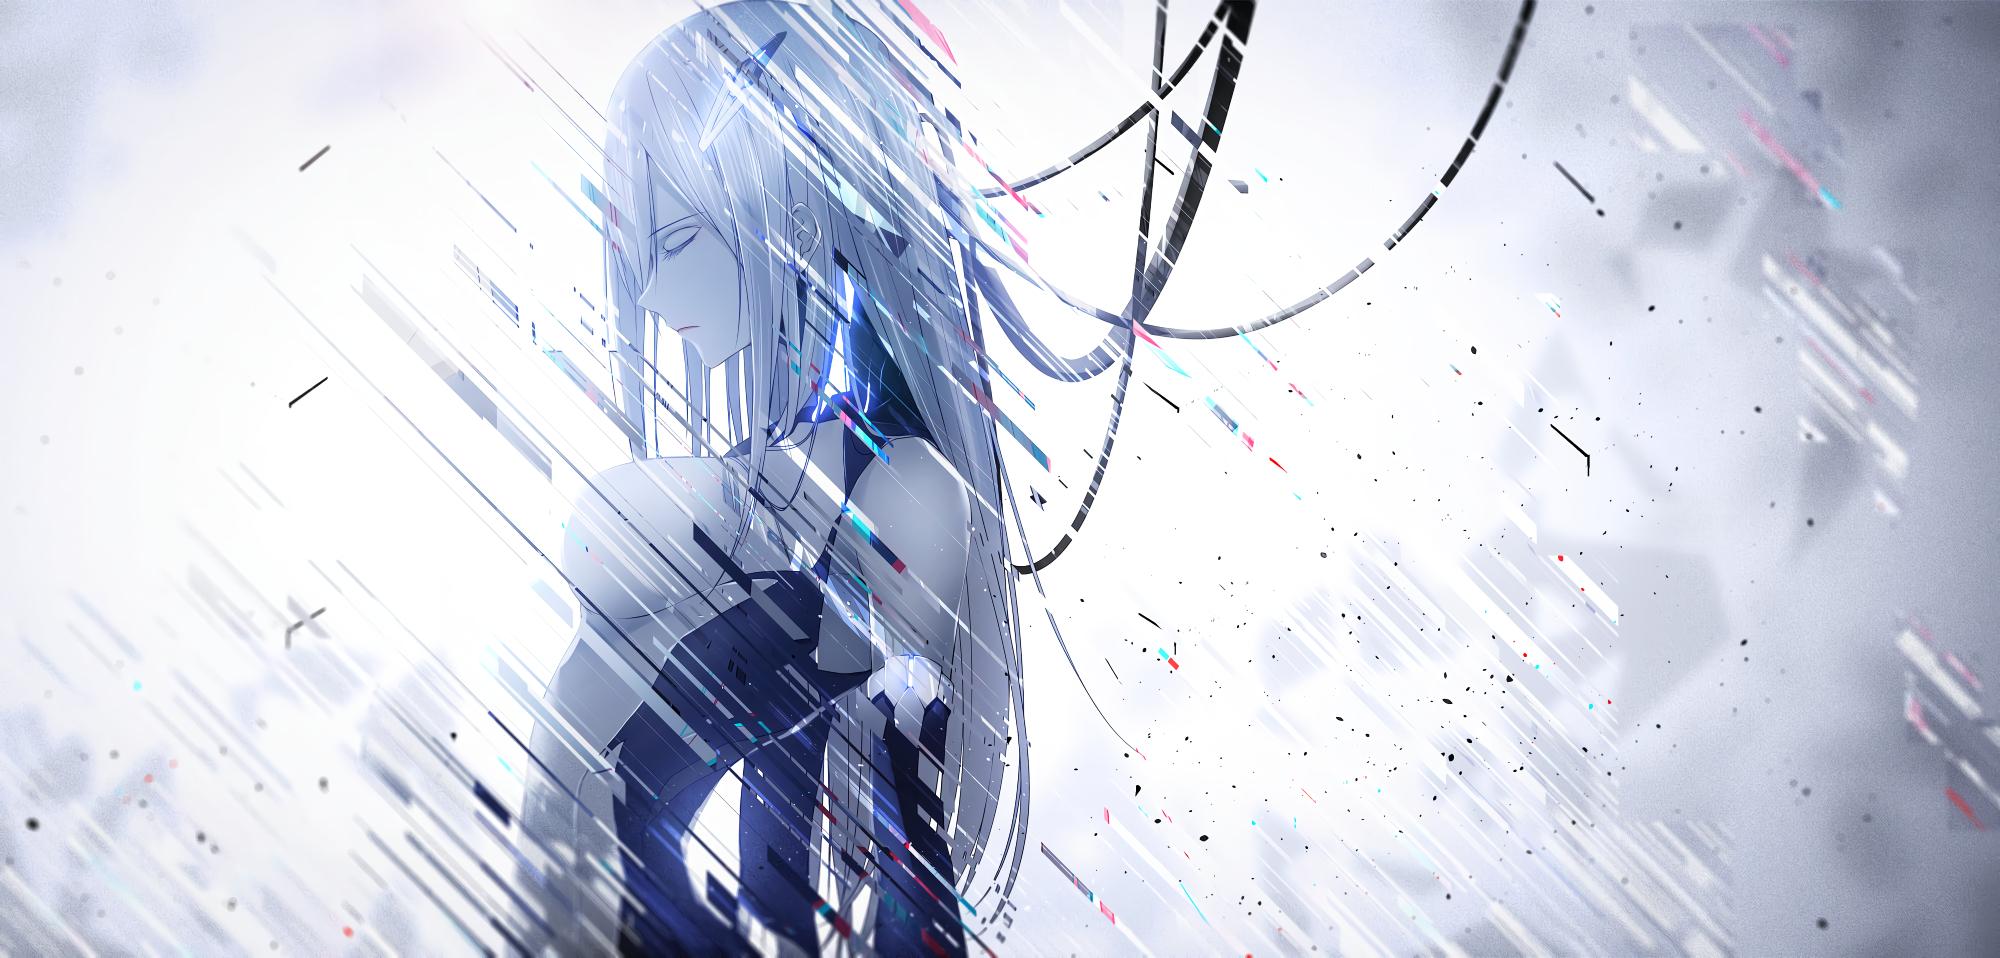 Anime 2000x958 original characters long hair silver hair braids mecha girls futuristic futuristic armor closed eyes glitch art bodysuit wires anime side view profile